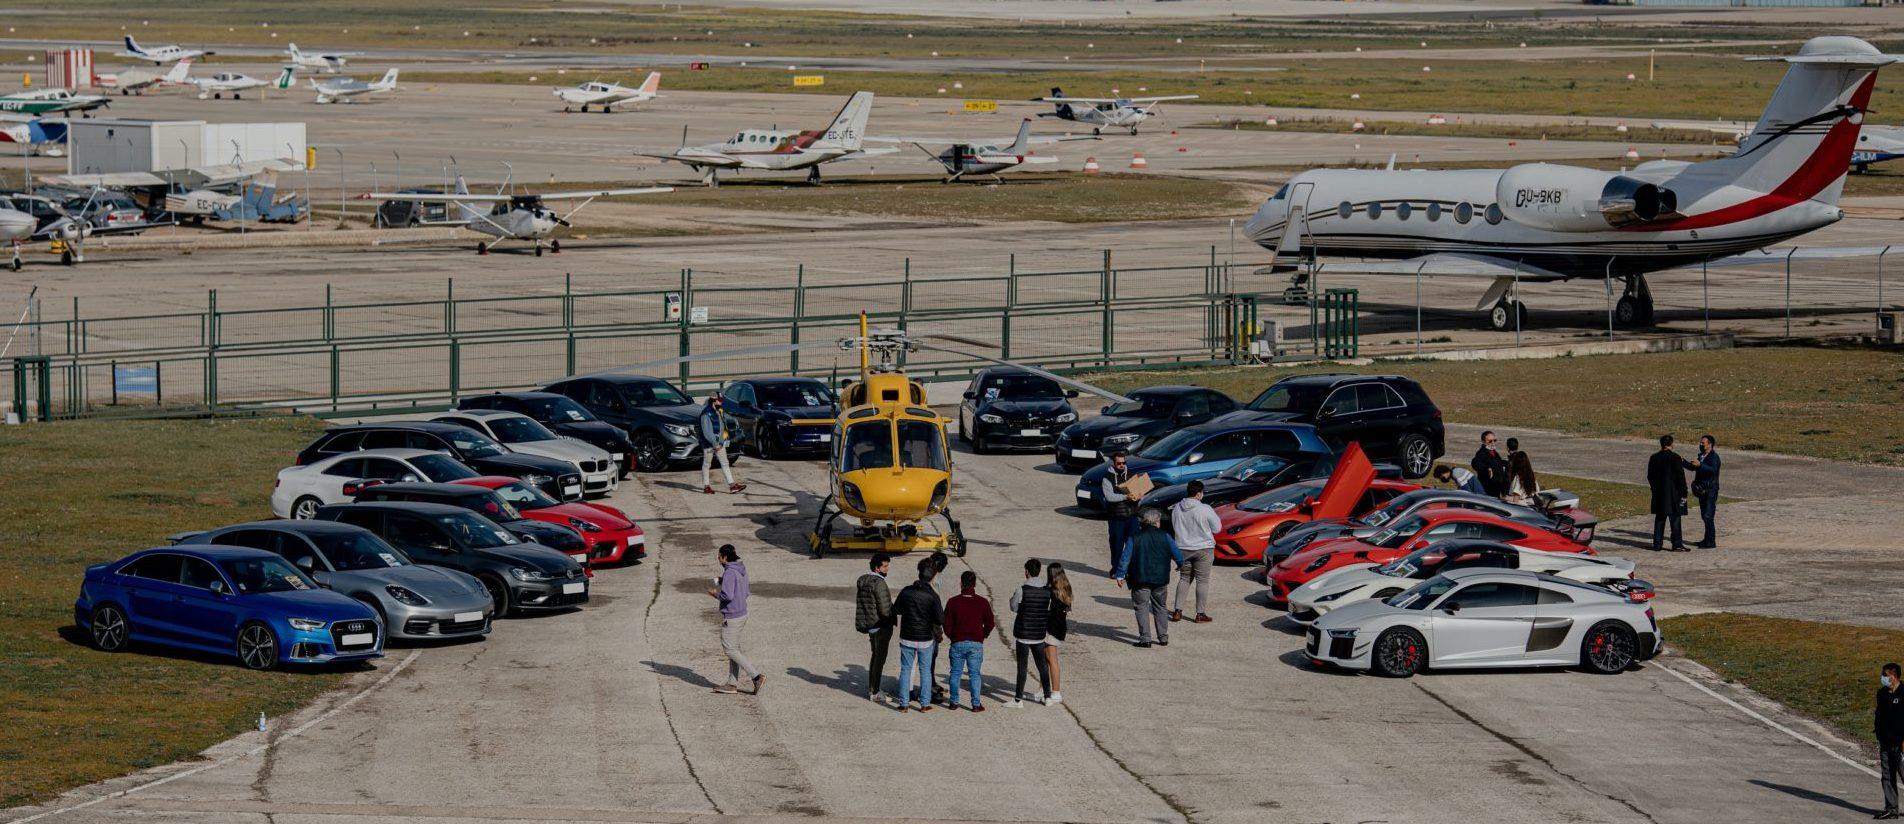 Parking Deportivos